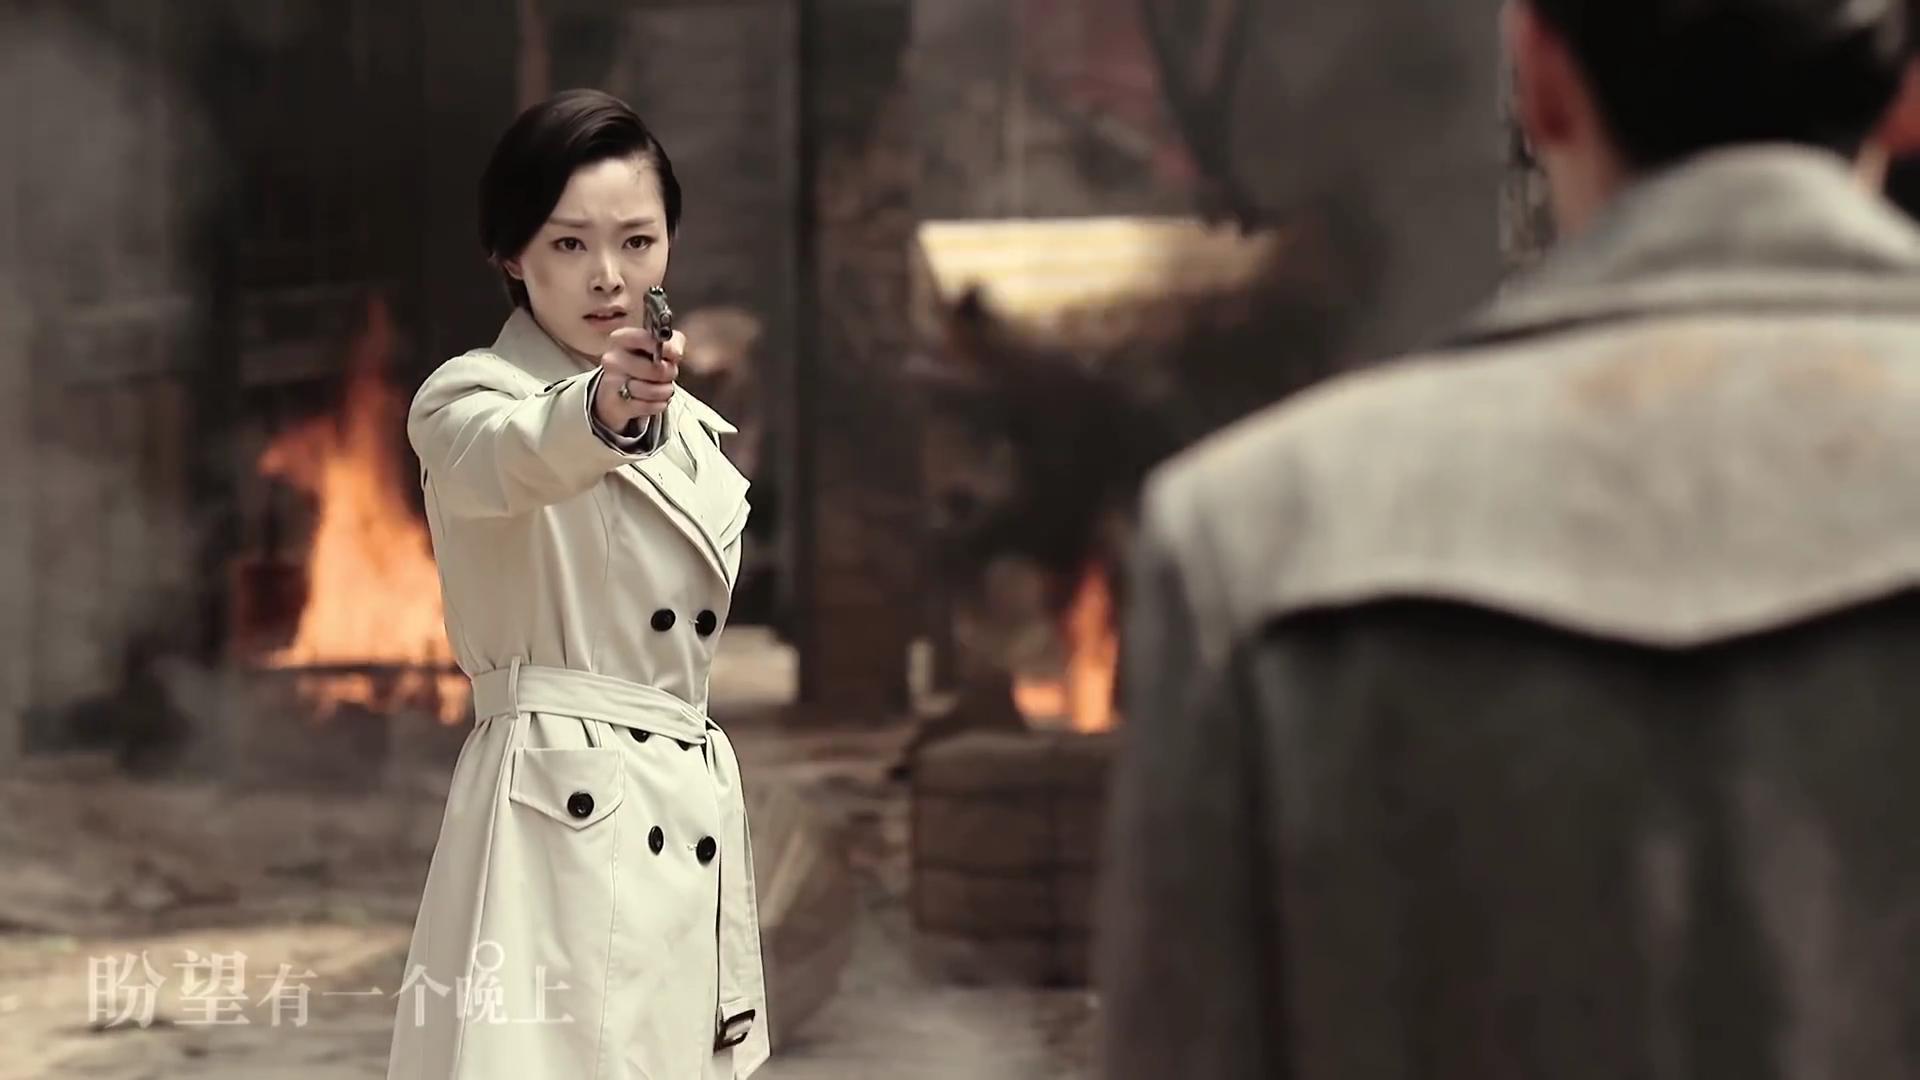 Kẻ Ngụy Trang - The Disguiser 2015